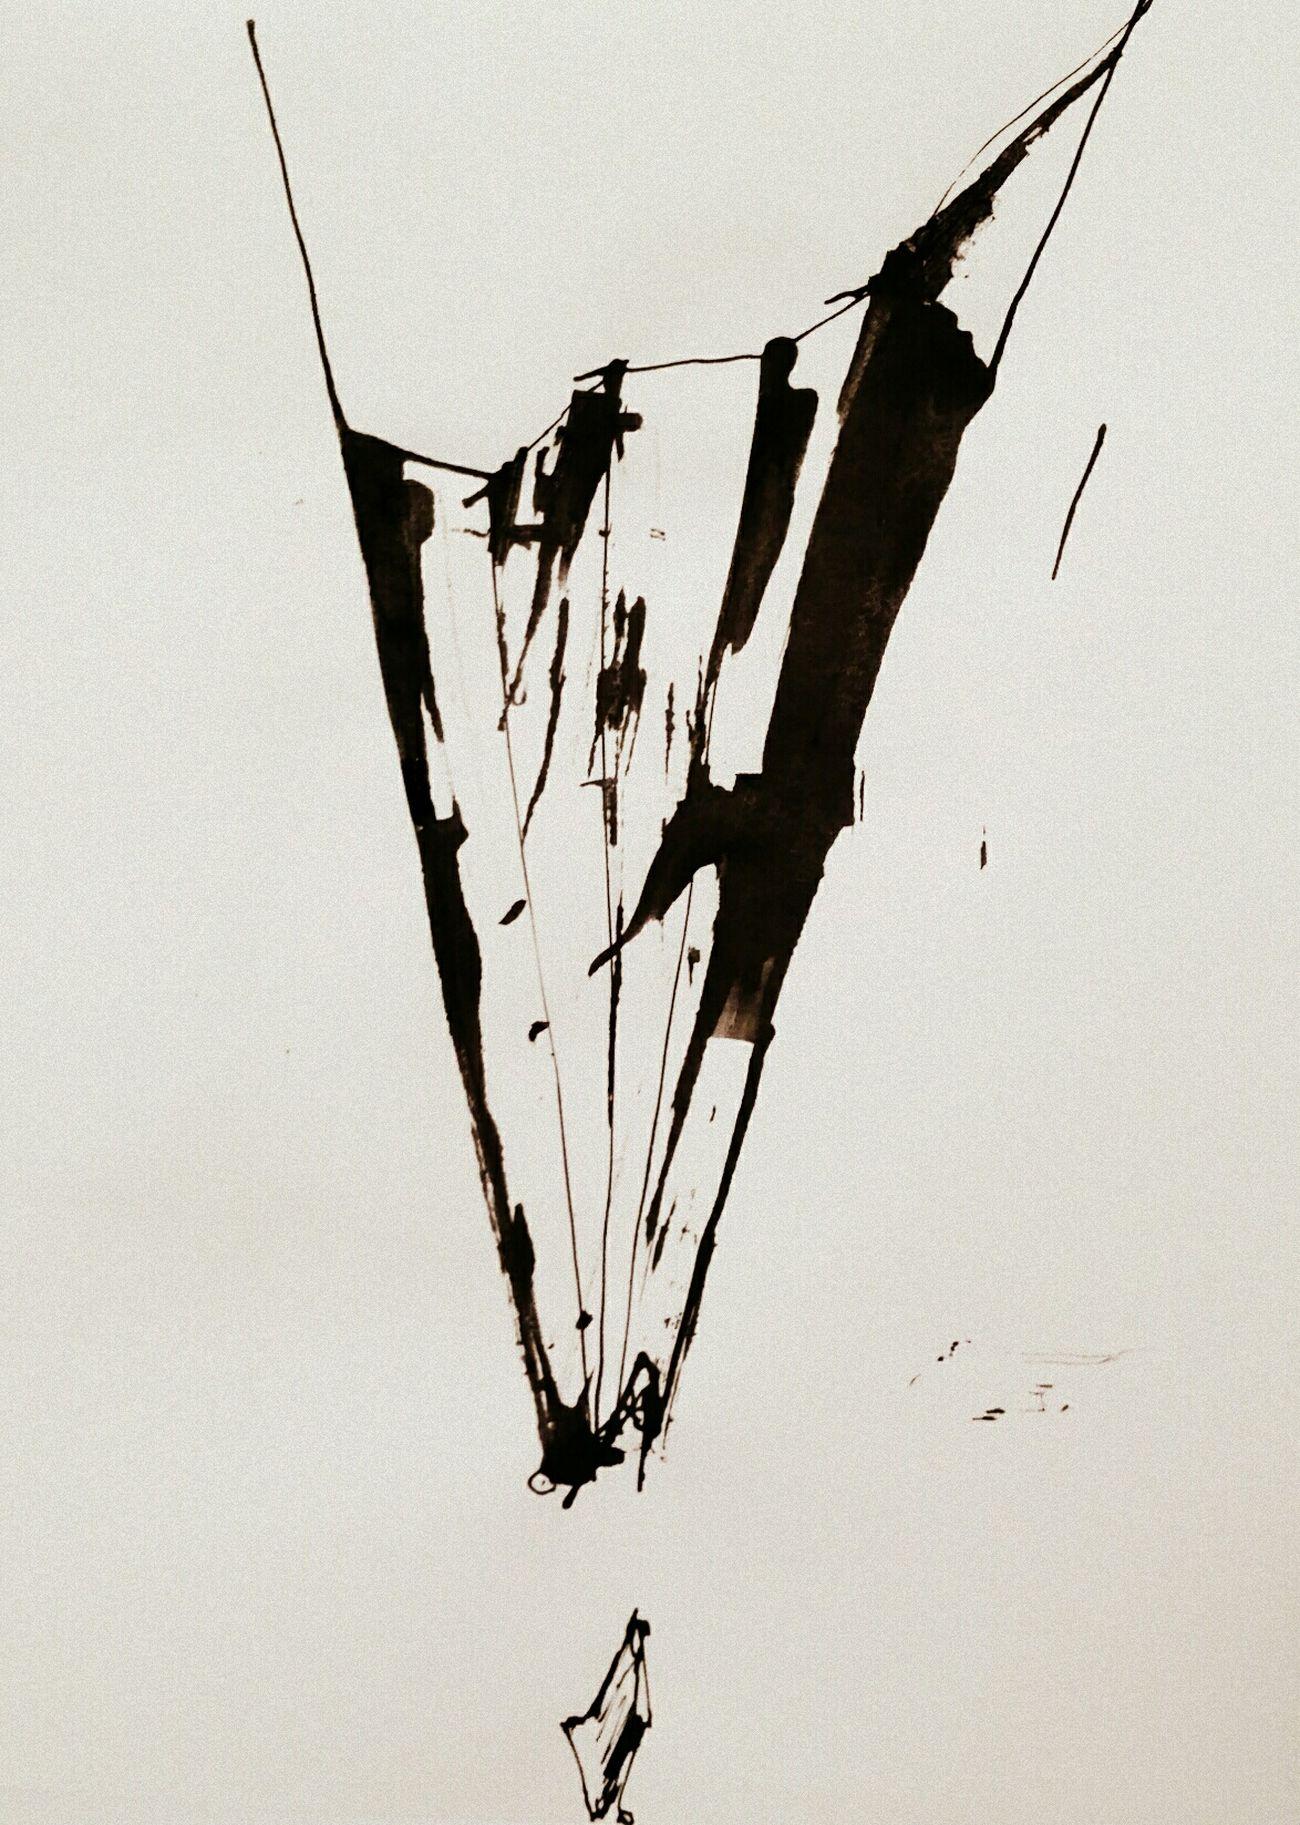 Heart, GraphitePencil, Black And White, Life, Break, Art, my Skatch. thanks